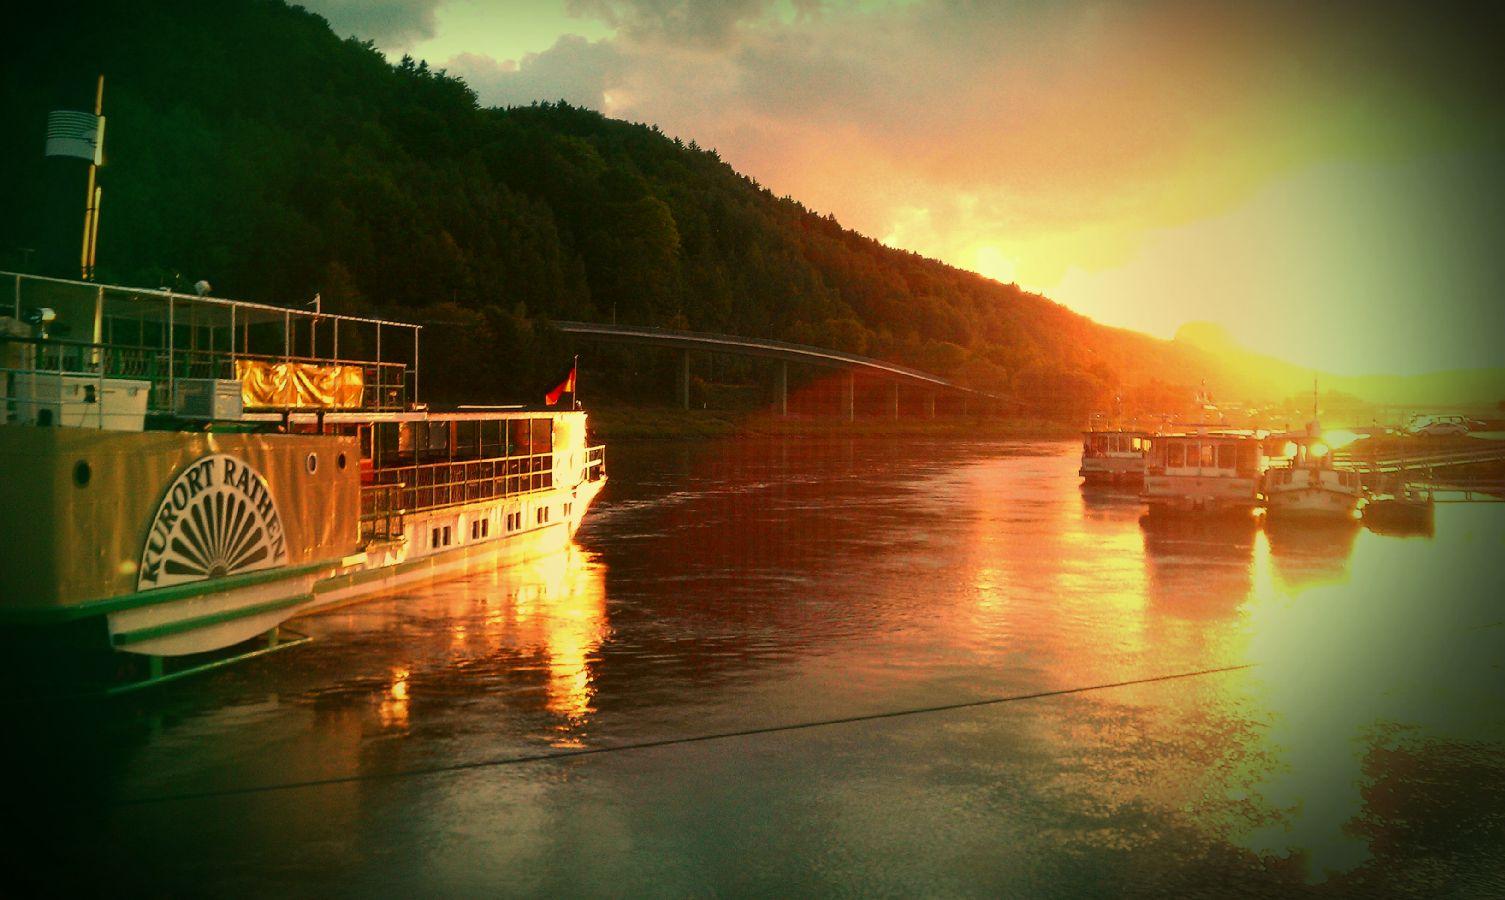 Sonnenuntergang, Elbe, Bad Schandau